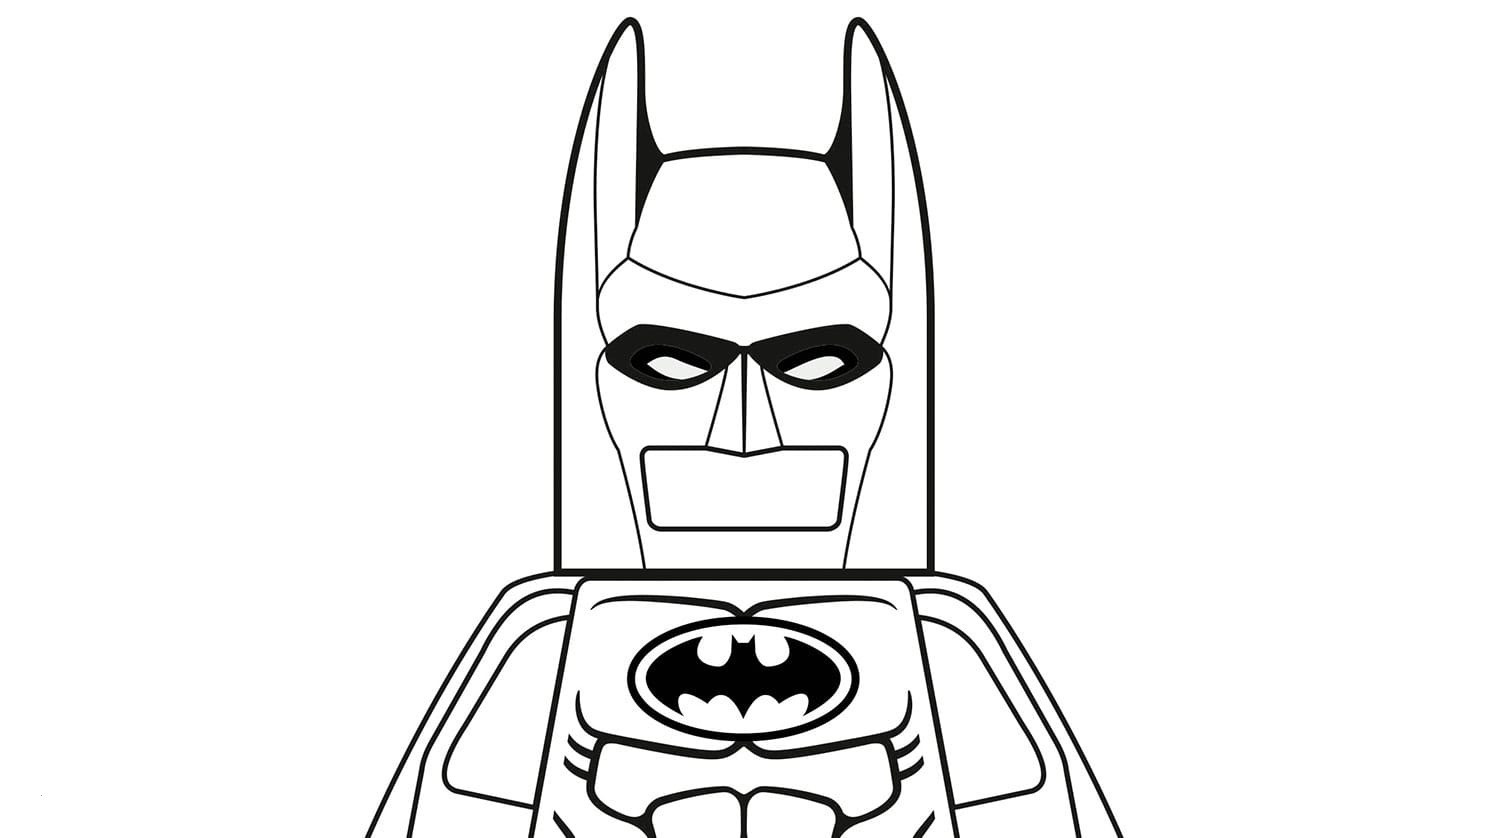 Ausmalbilder Batman Lego Neu Lego Batman Ausmalbilder Kostenlos Luxury 25 Druckbar Ausmalbilder Sammlung